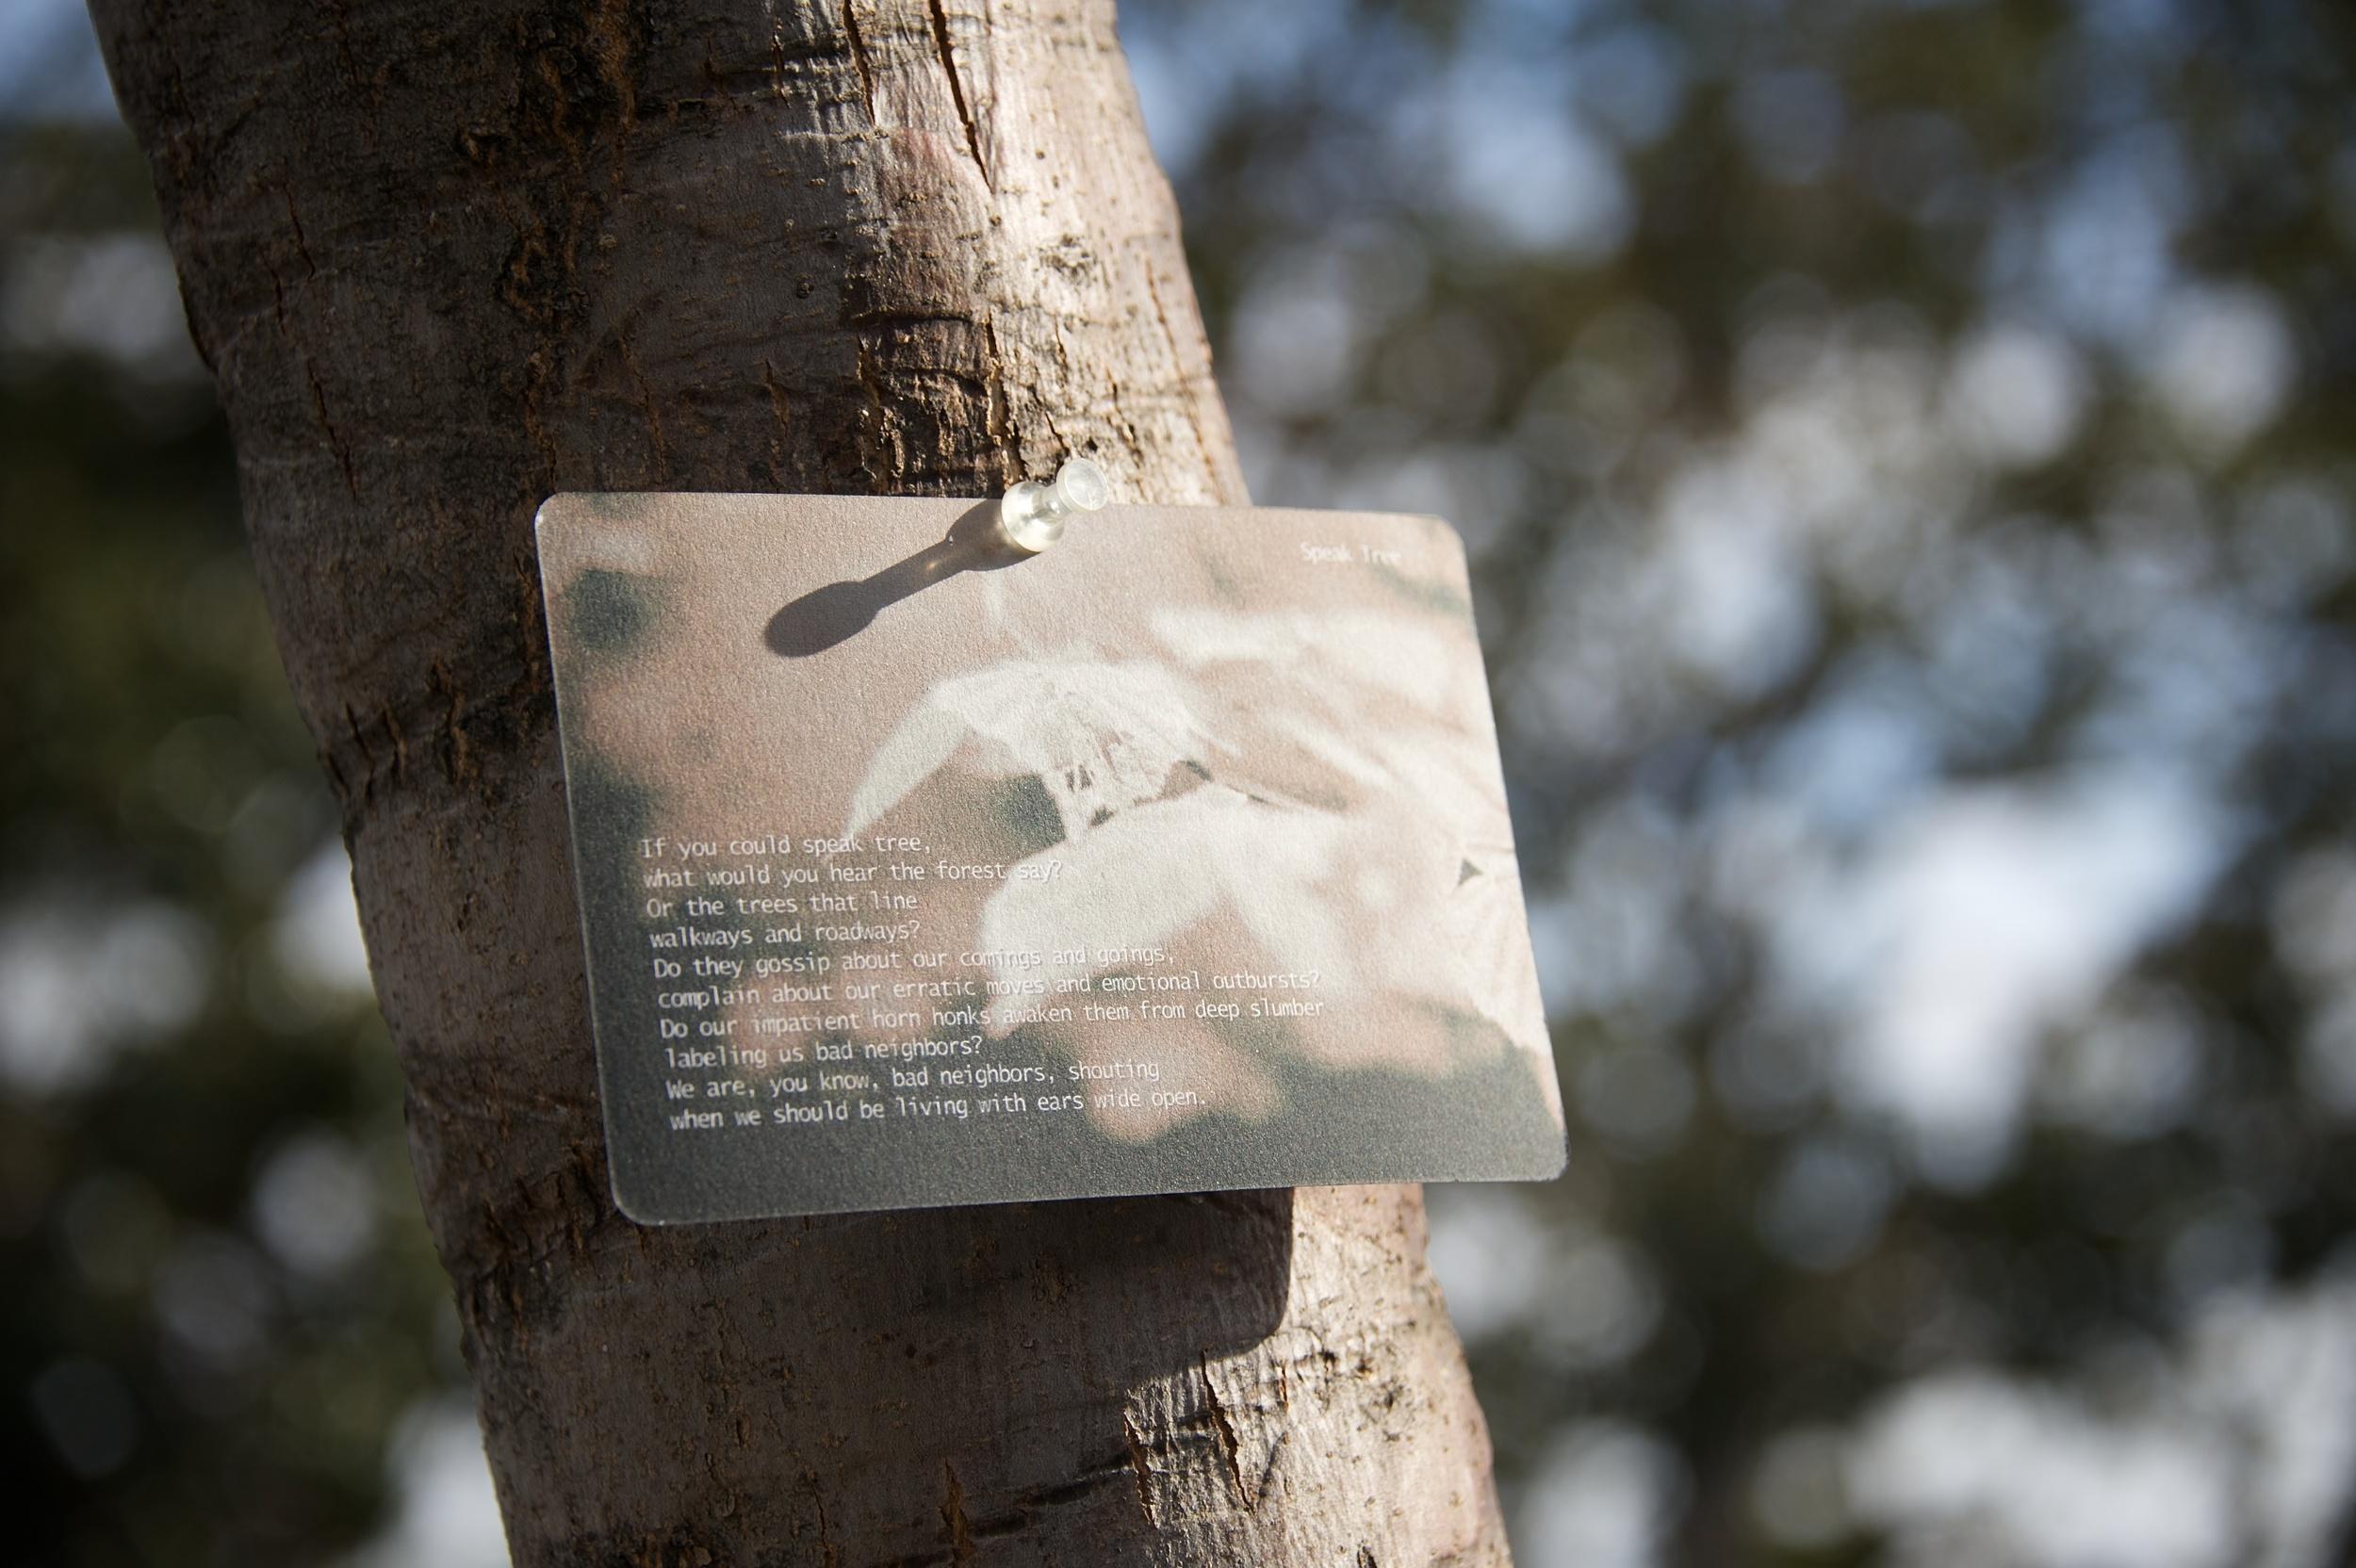 'Speak Tree' on Tujunga in Studio City.